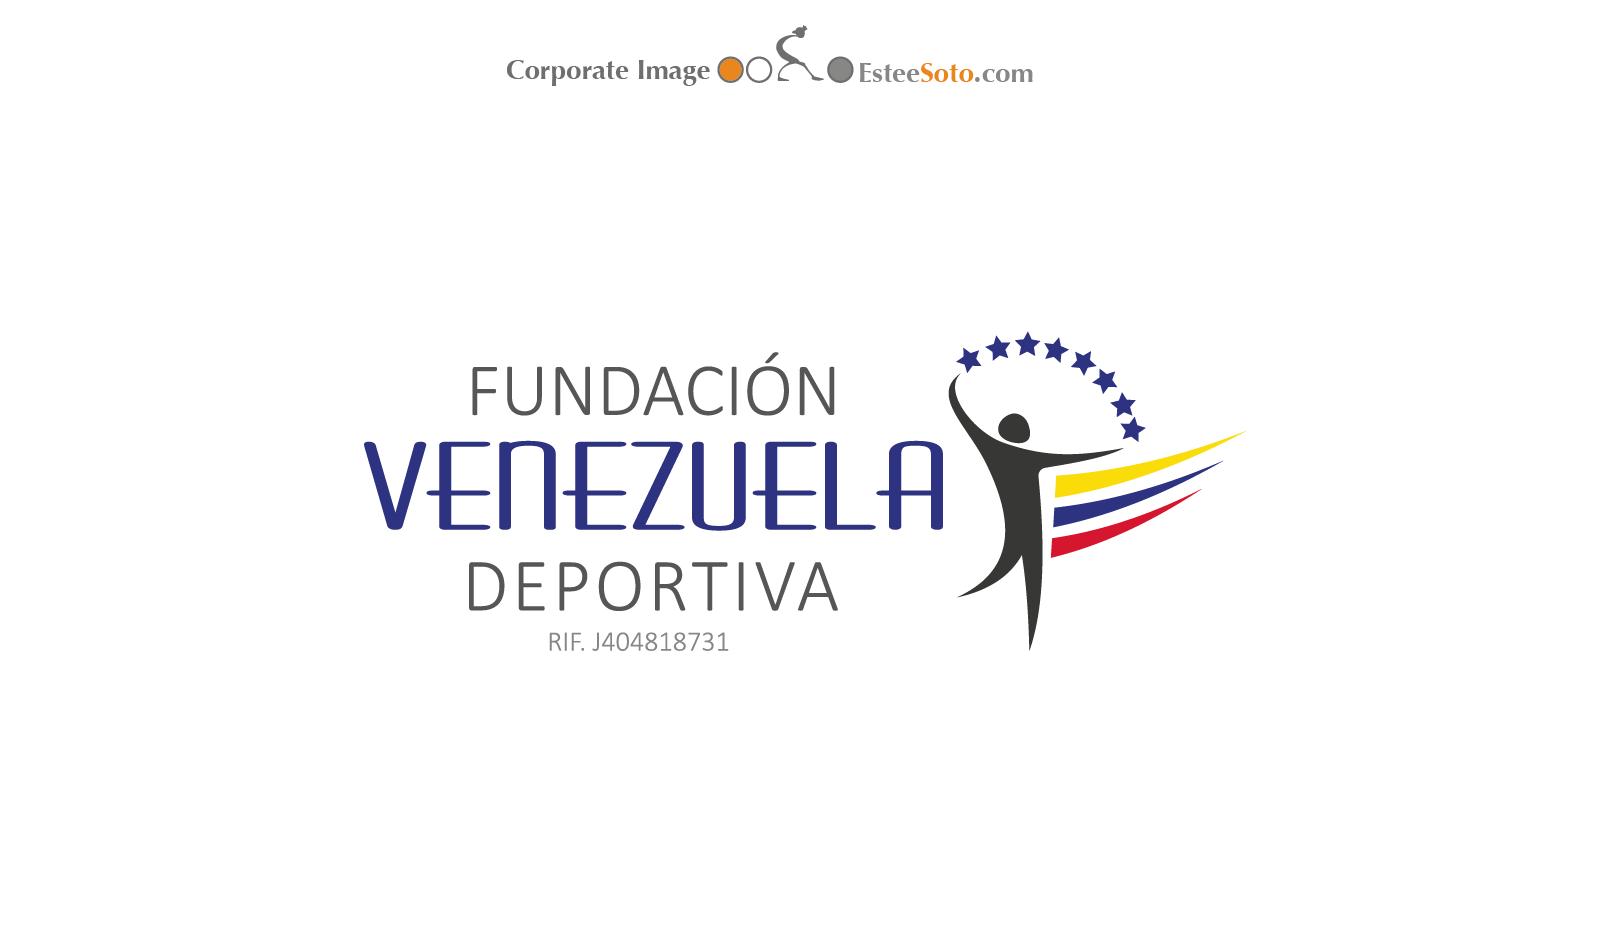 Corporate Image Fundación Vzla. Deportiva